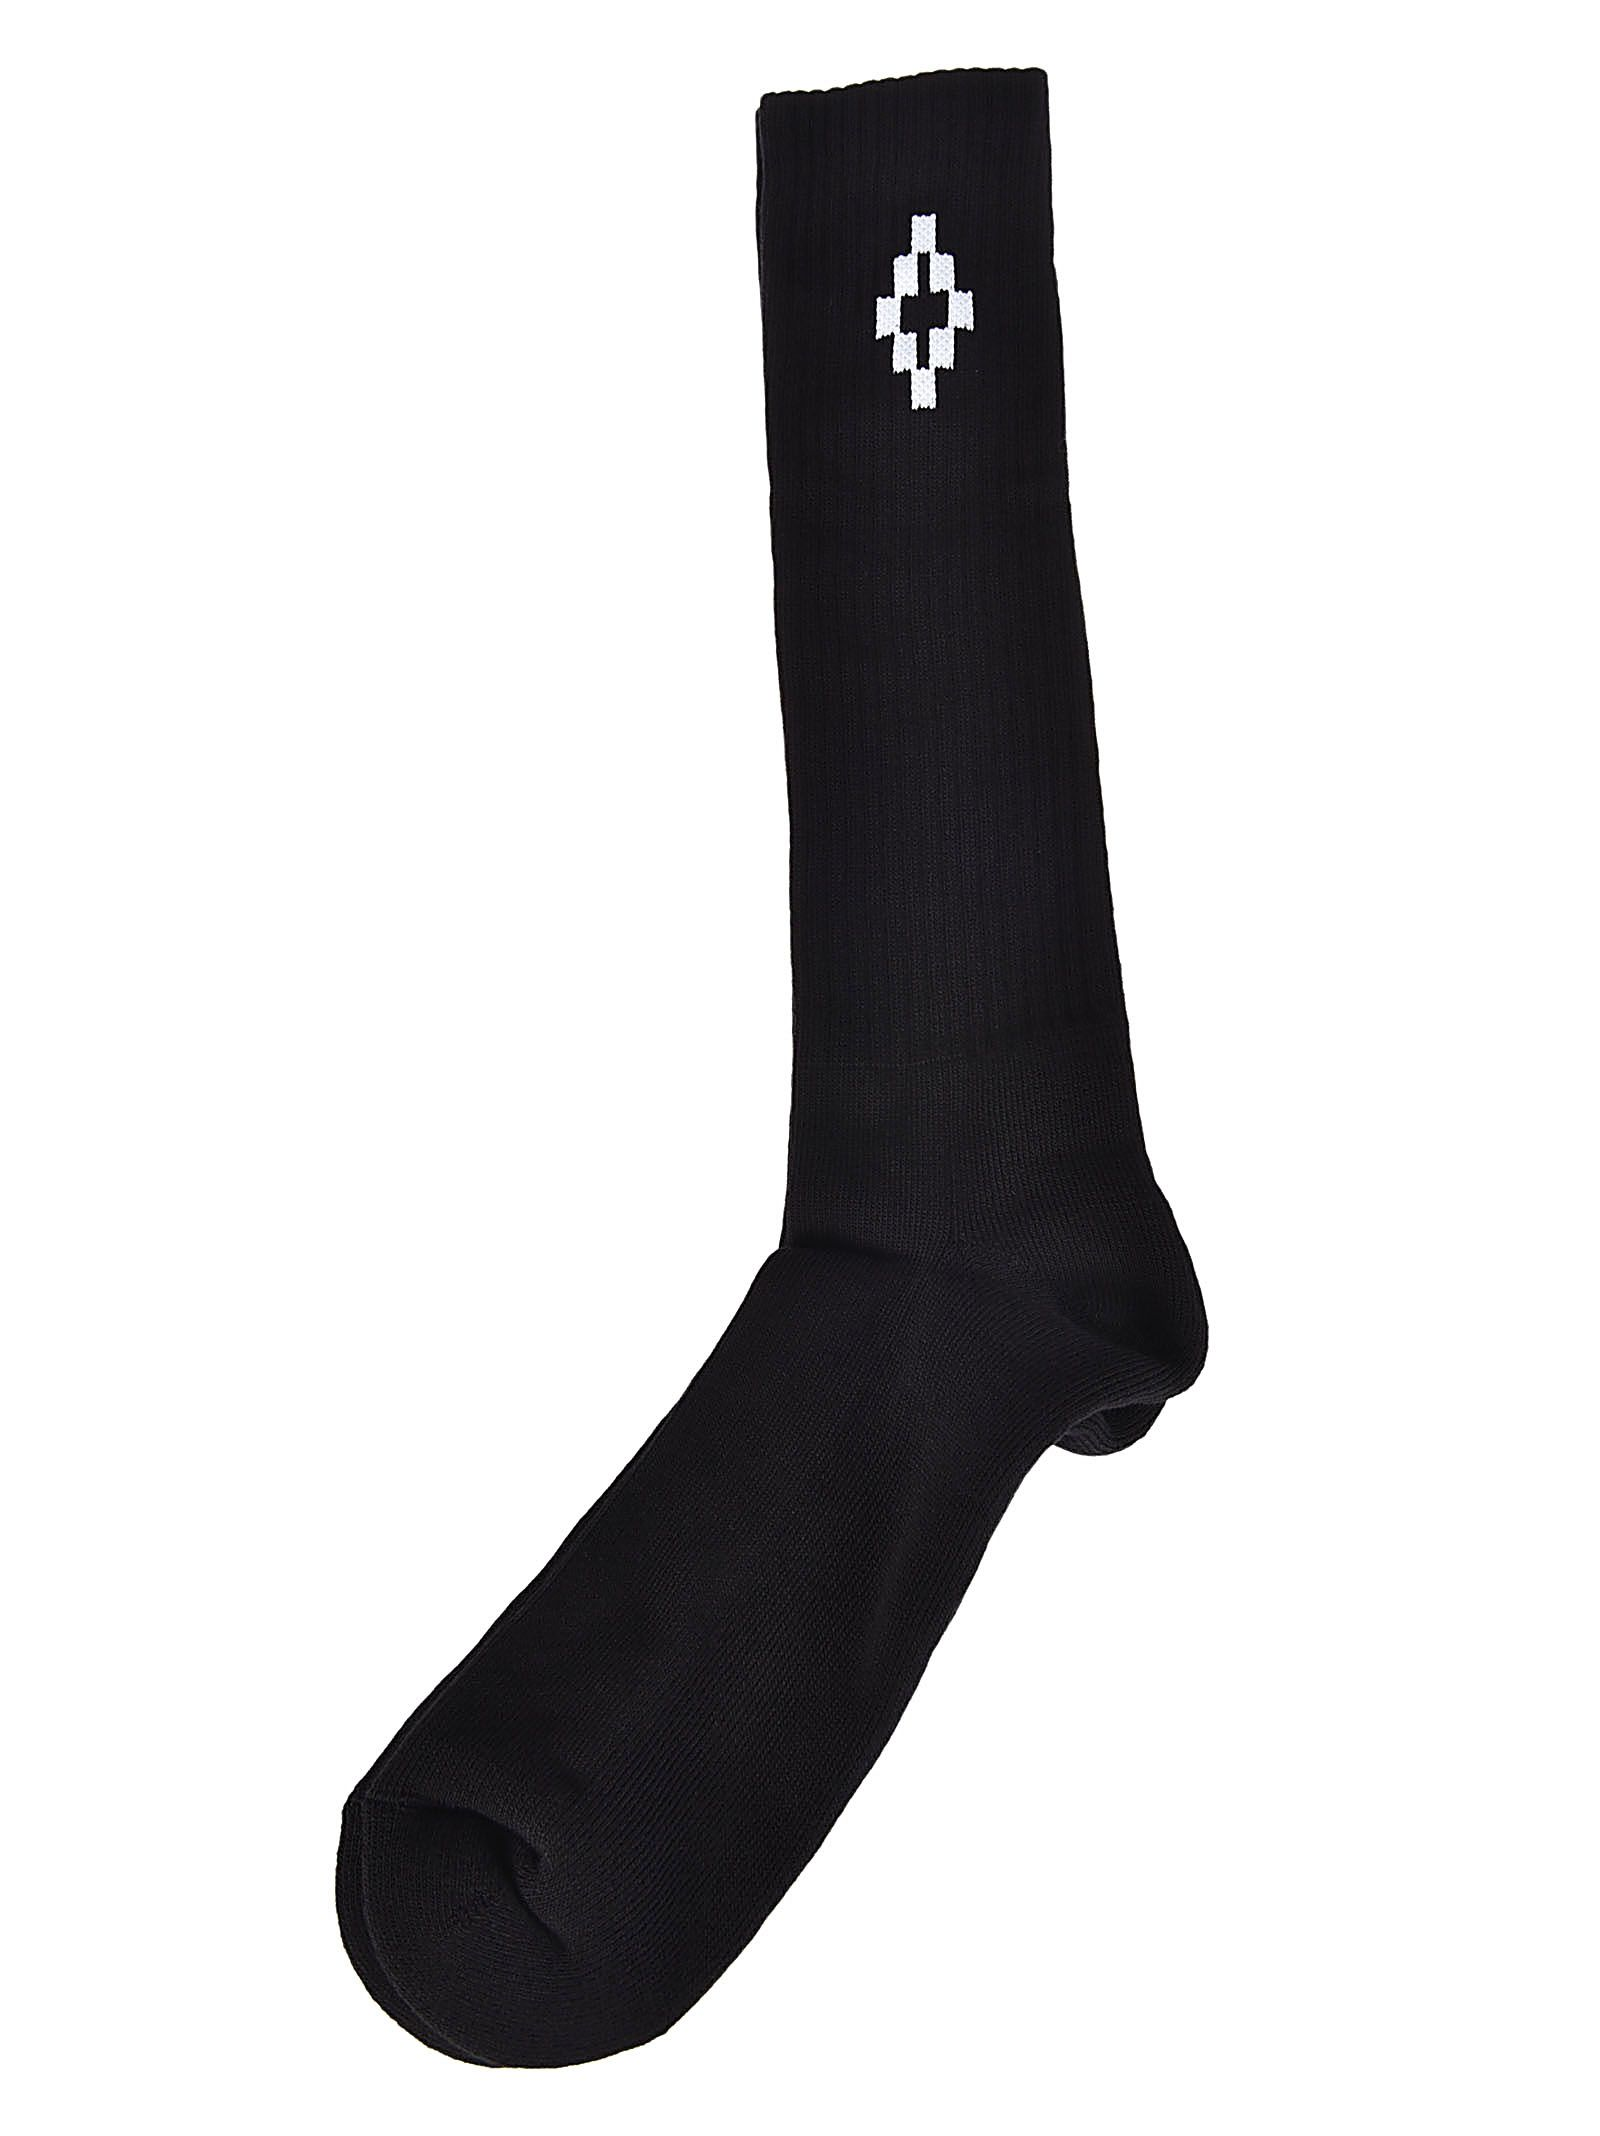 Marcelo Burlon Cruz Long Socks